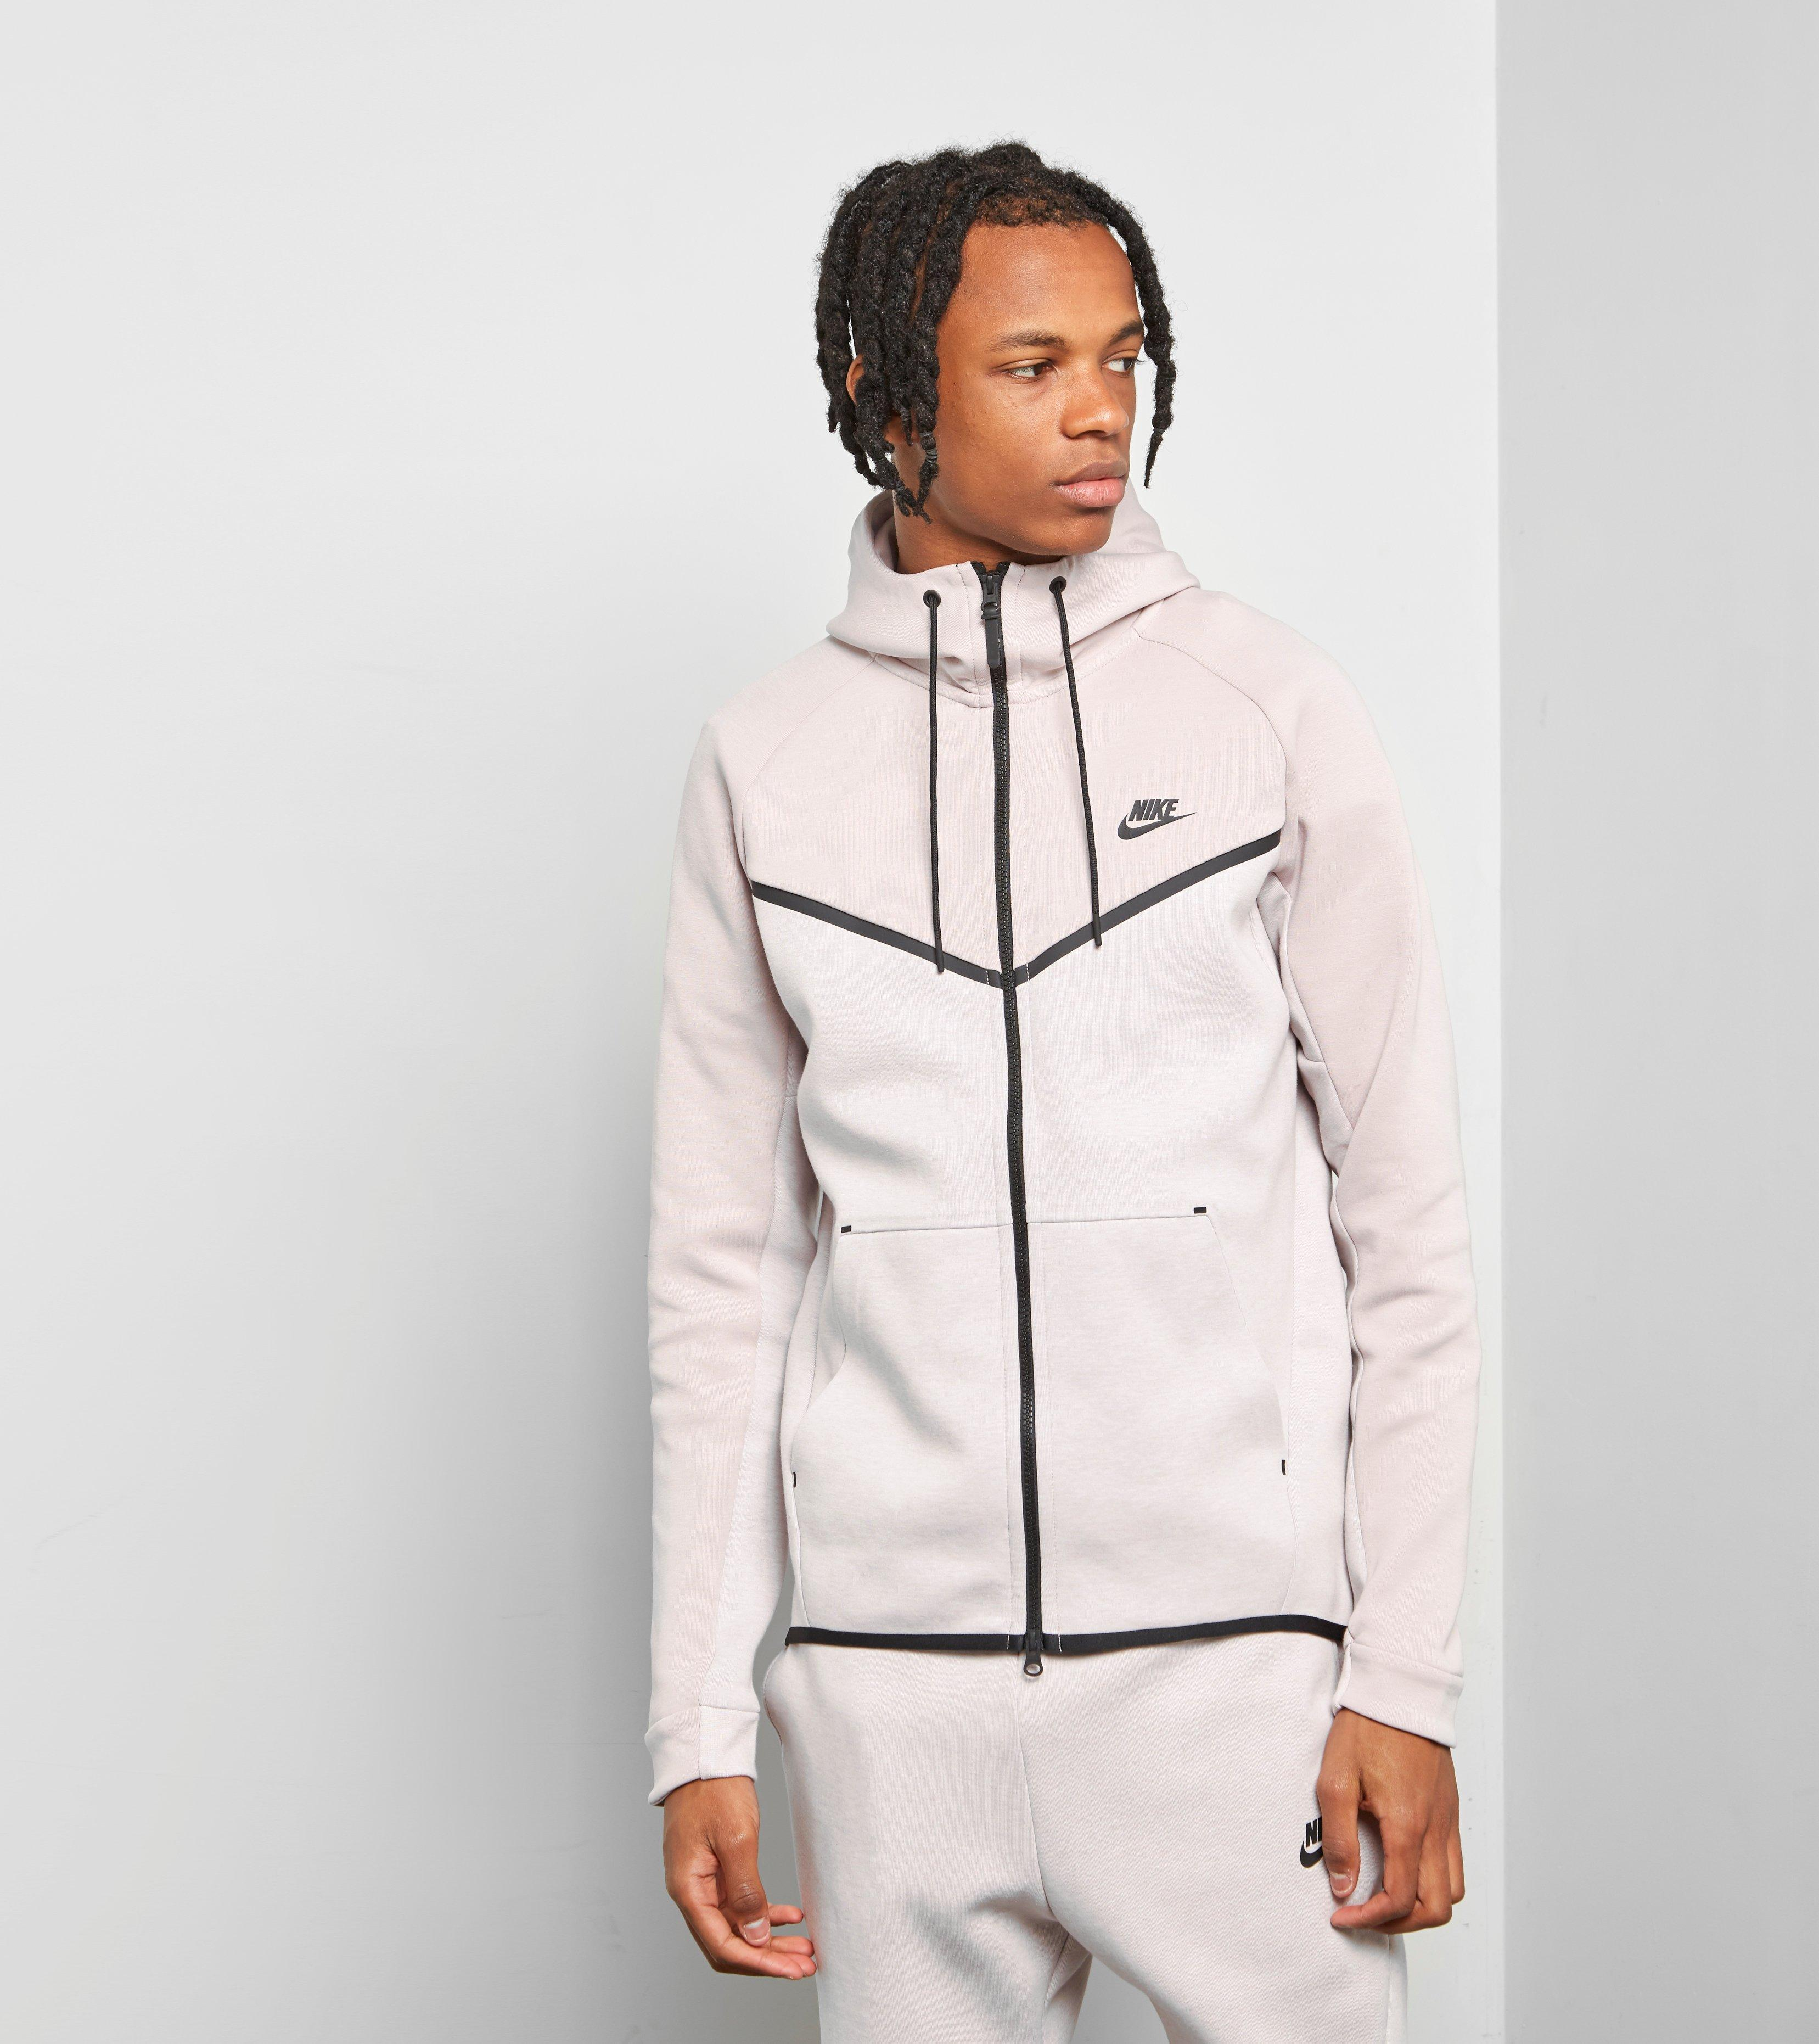 ad111ce562 Lyst - Nike Tech Fleece Windrunner Hoody in Pink for Men